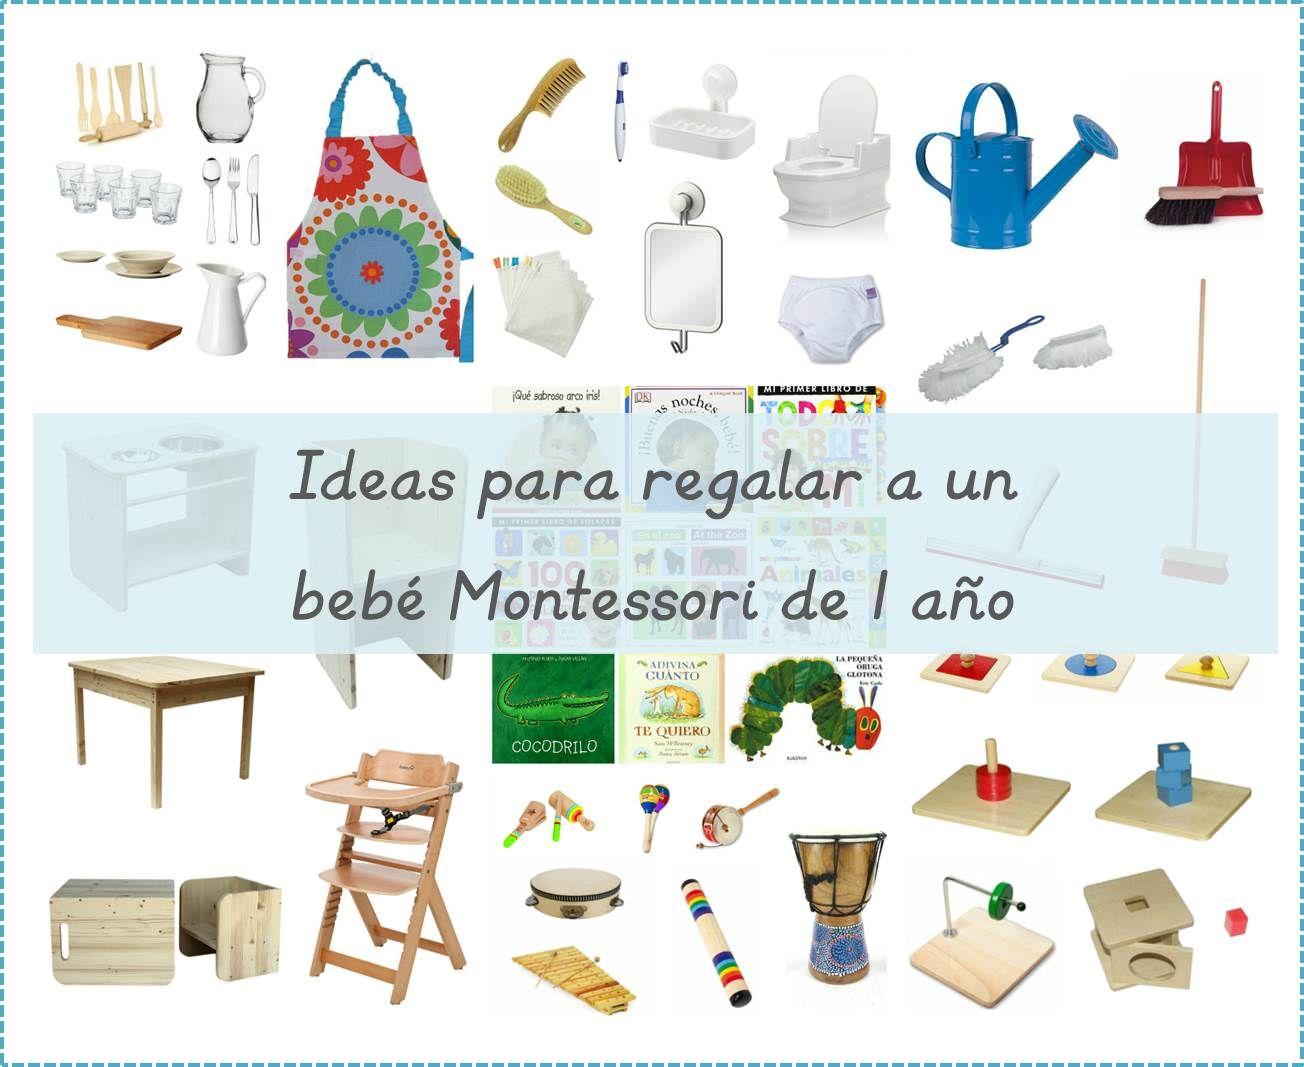 Educational Gift Ideas For 1 Year Old: 50+ Ideas Para Regalar A Un Bebé Montessori De 1 Año